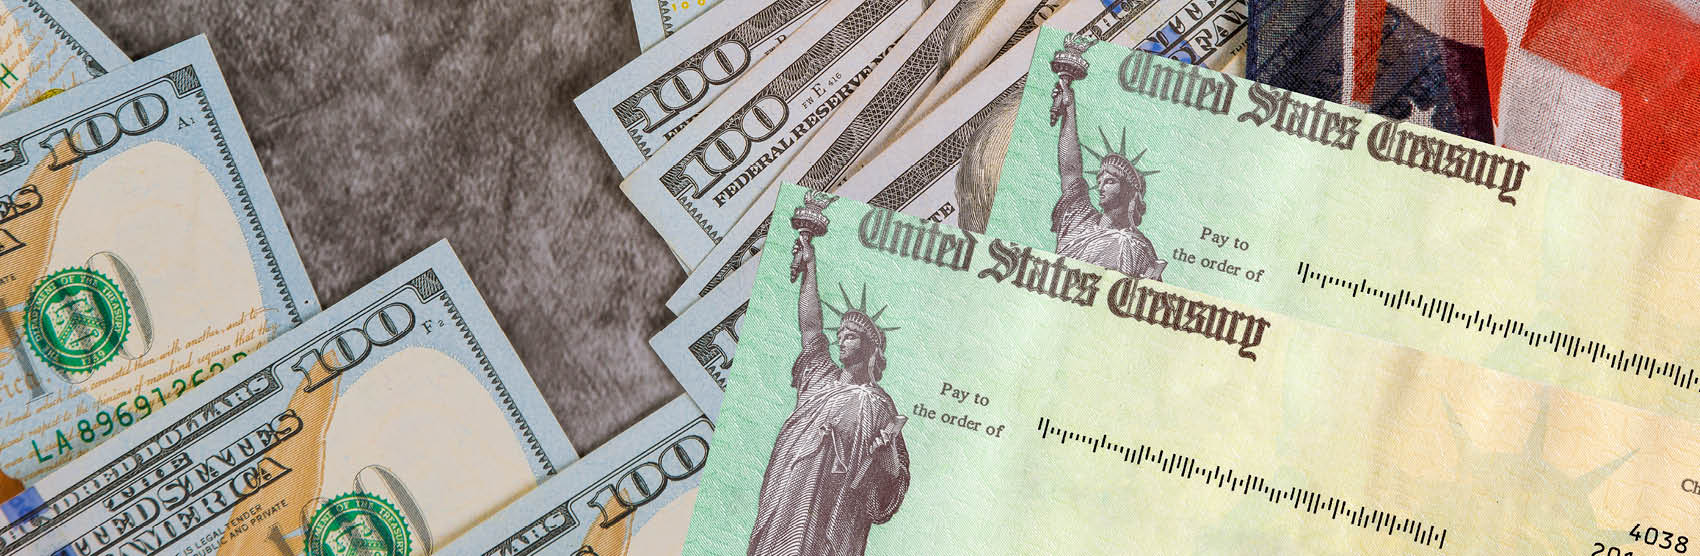 Image of American dollars and blank US treasury checks